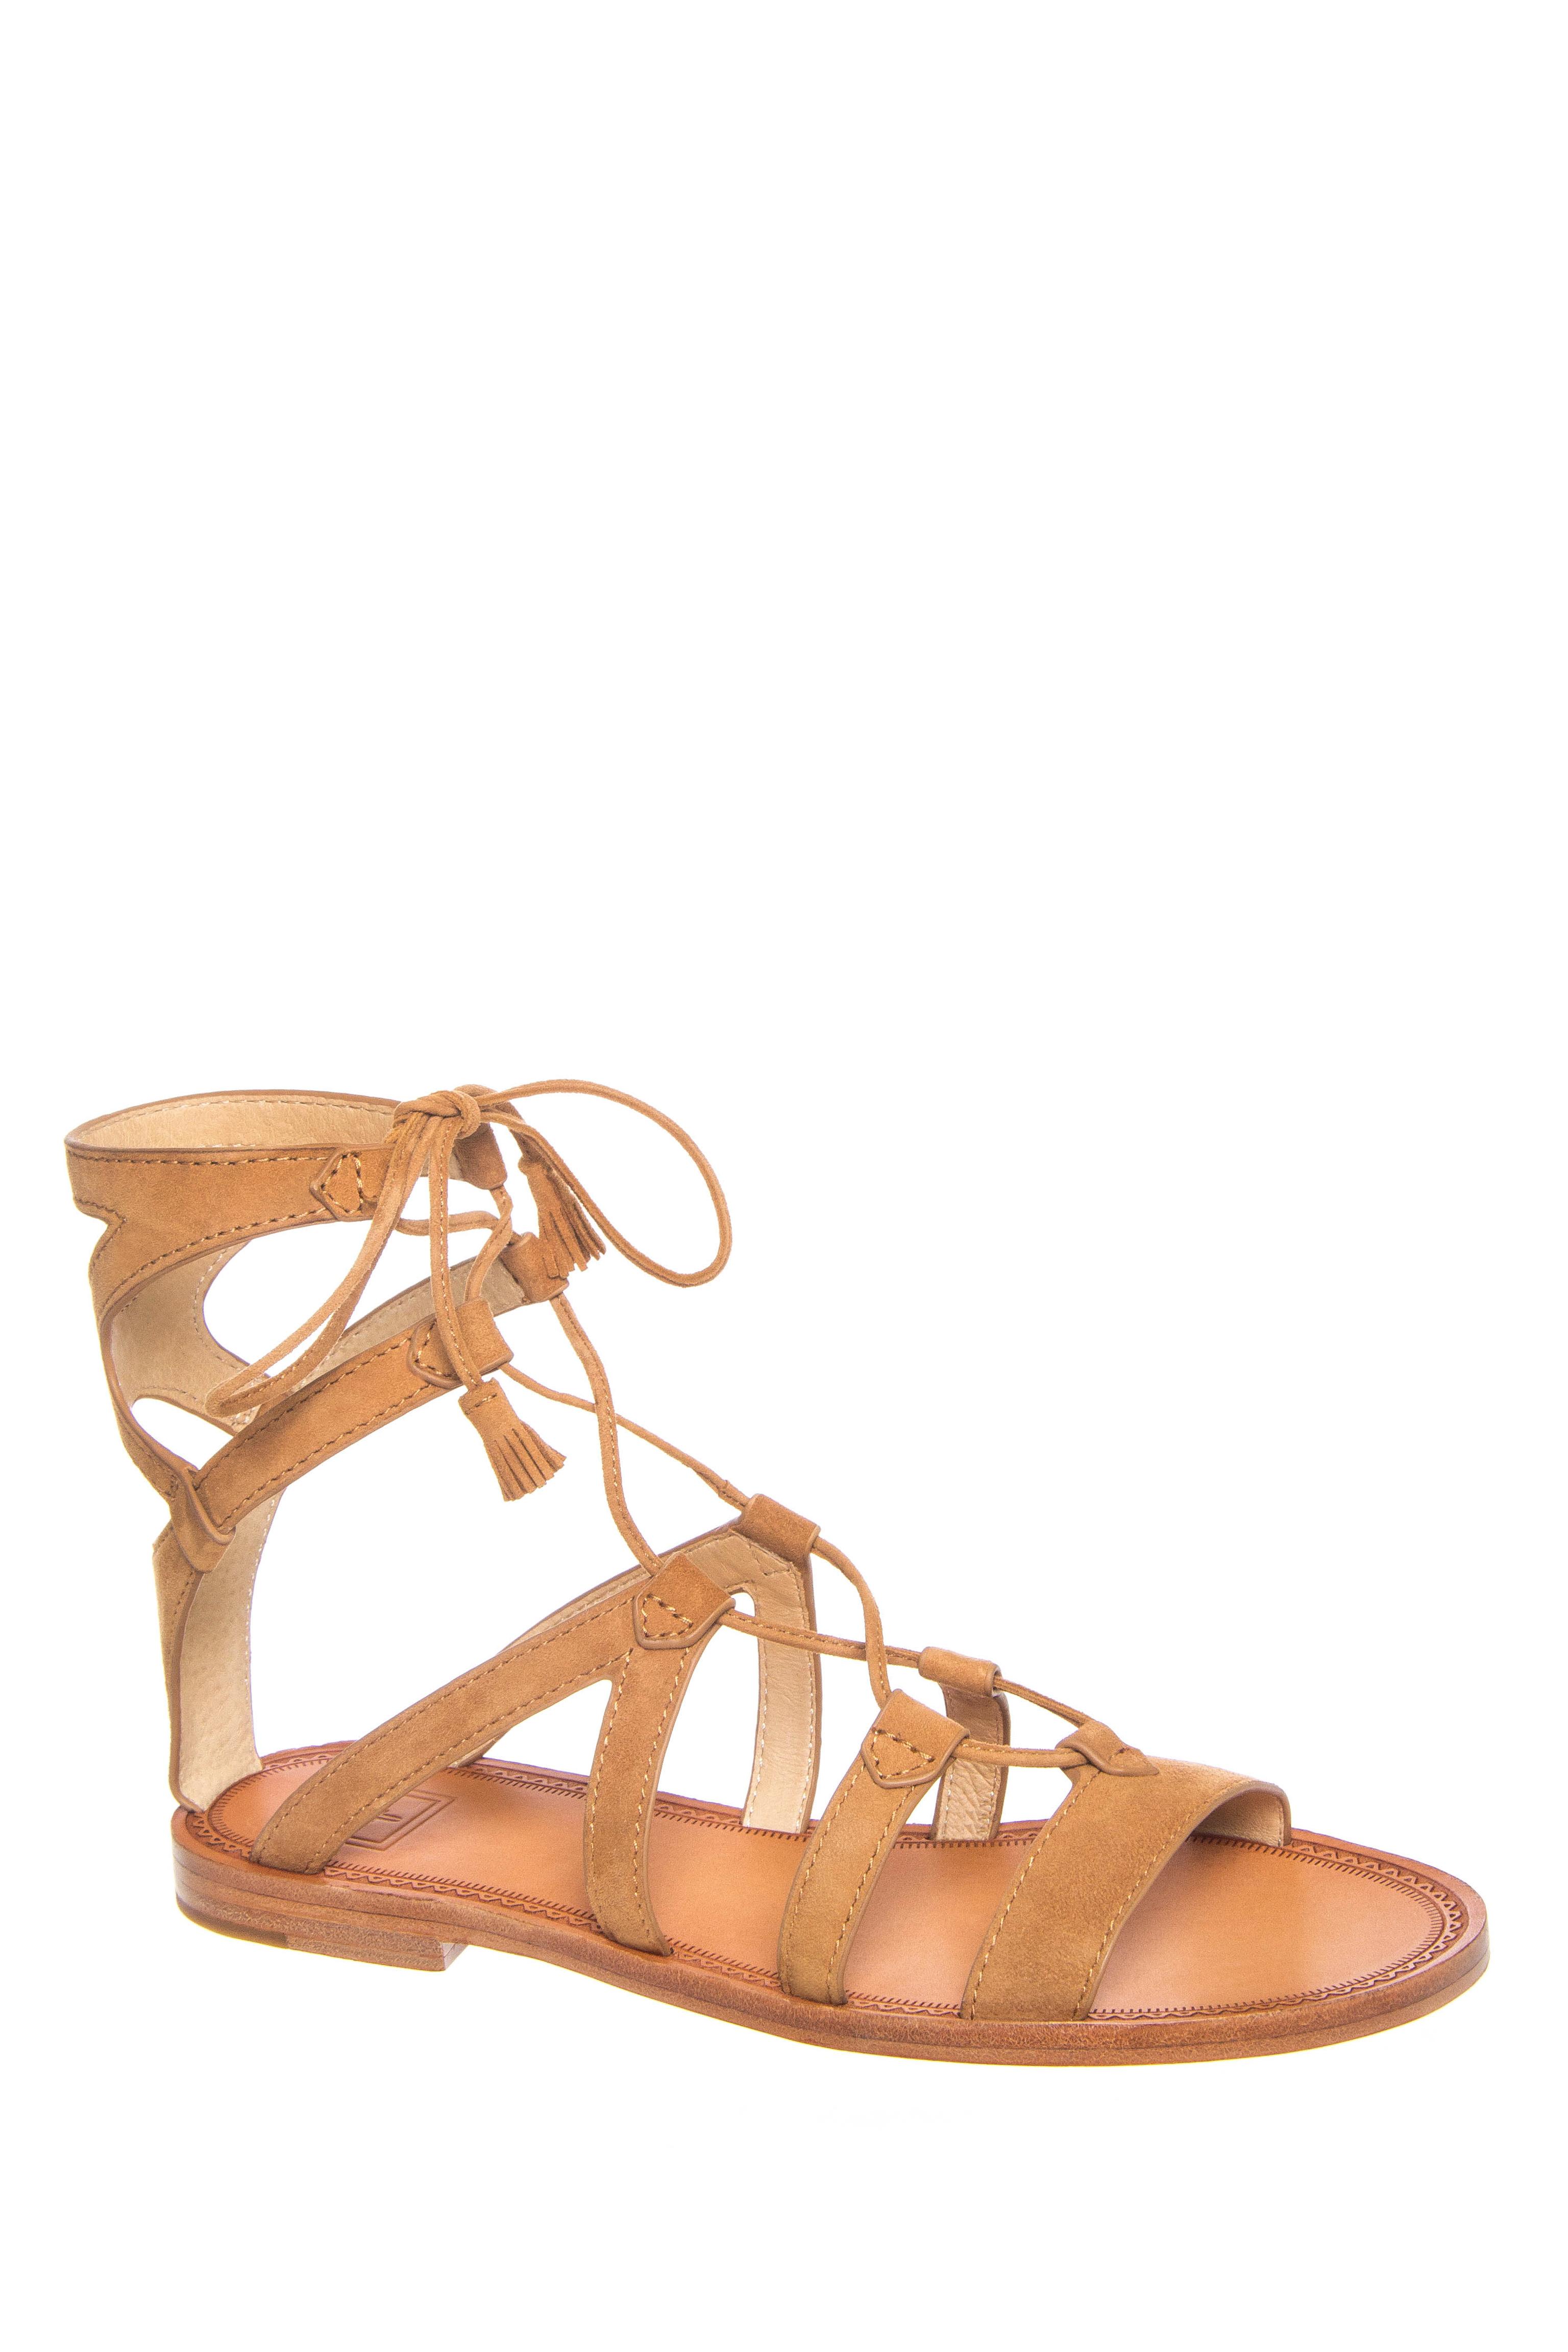 Frye Ruth Gladiator Sandals - Sand